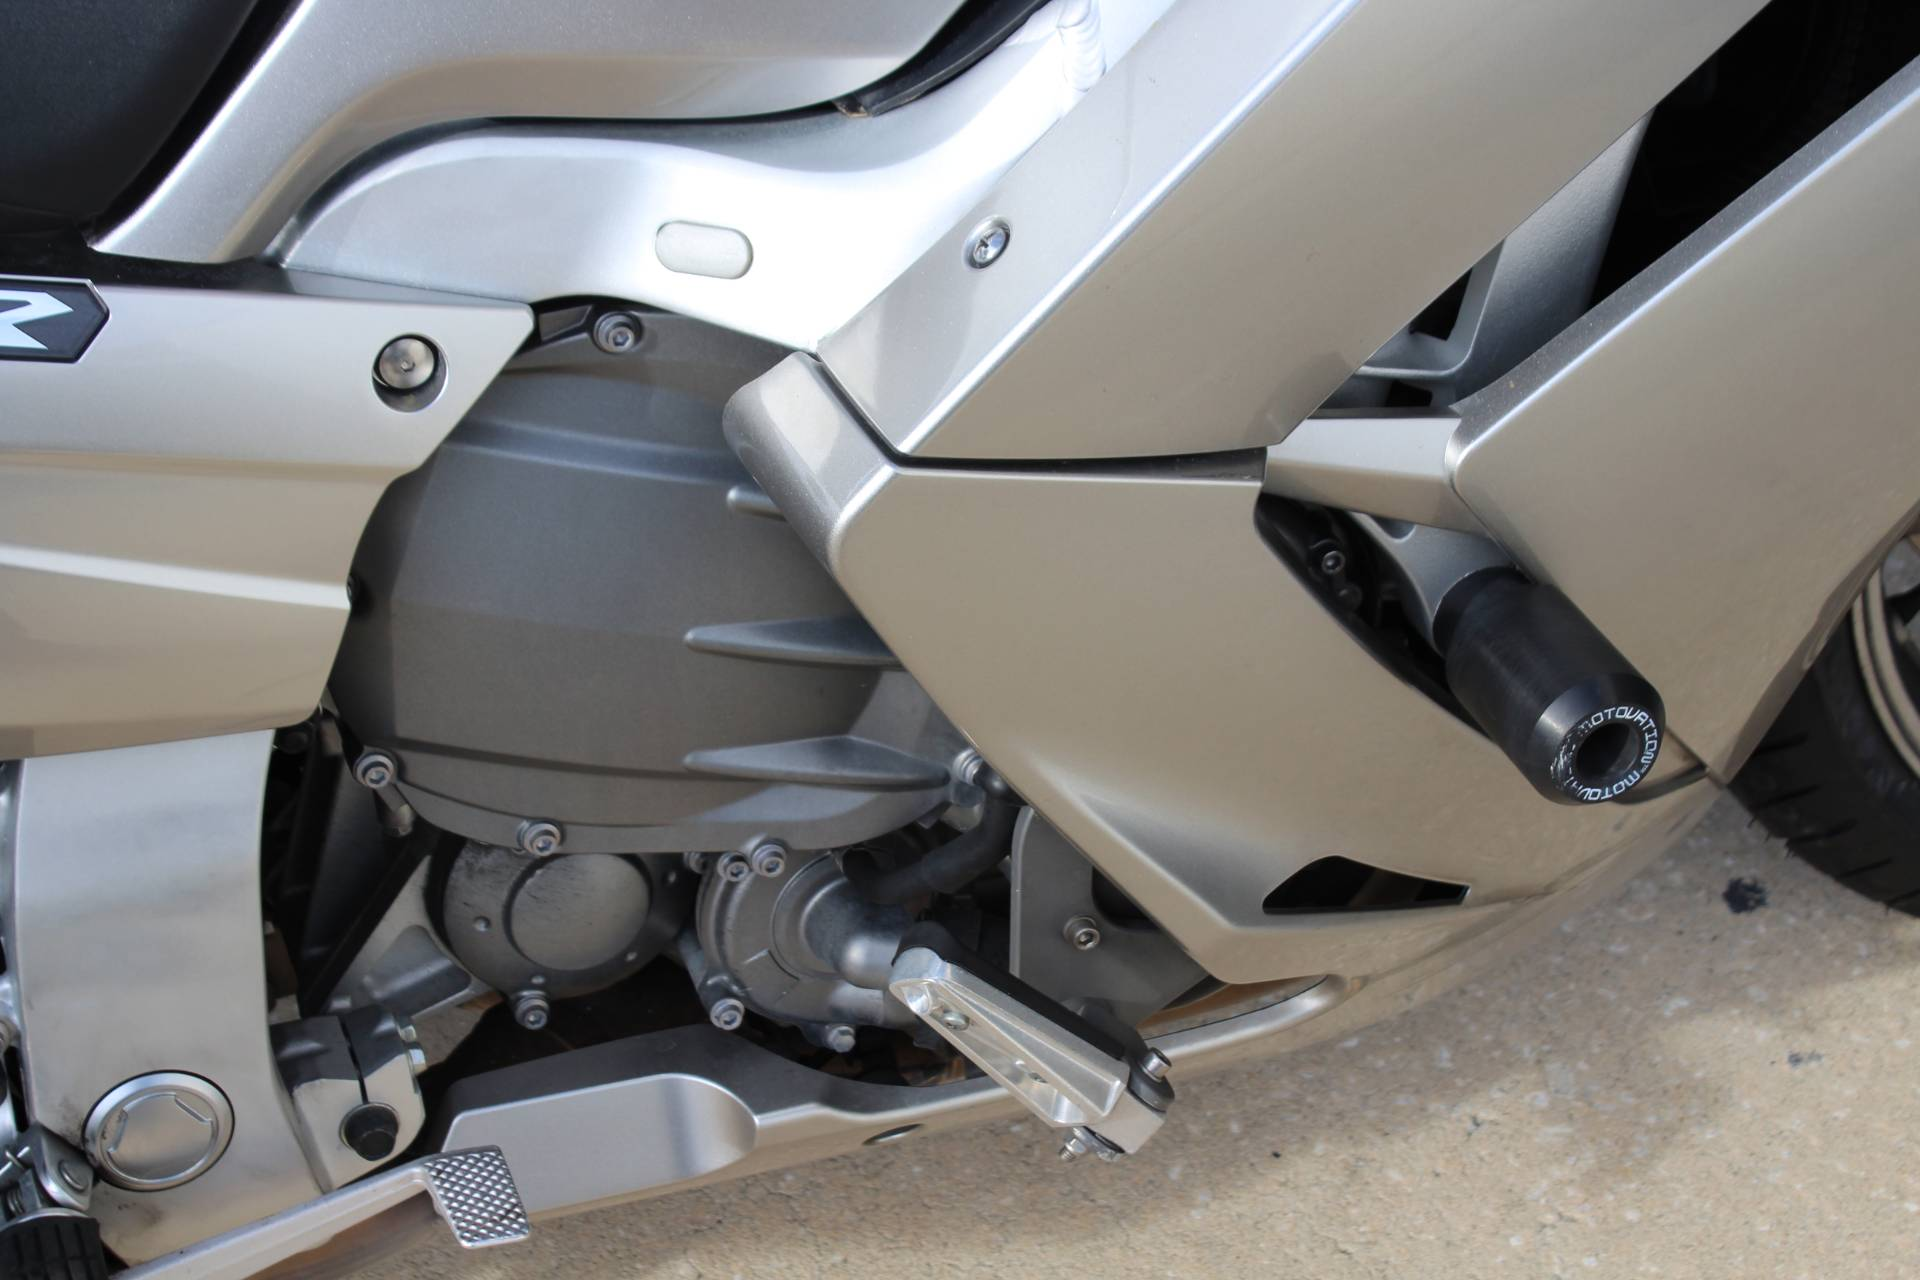 2010 Yamaha FJR1300A 6